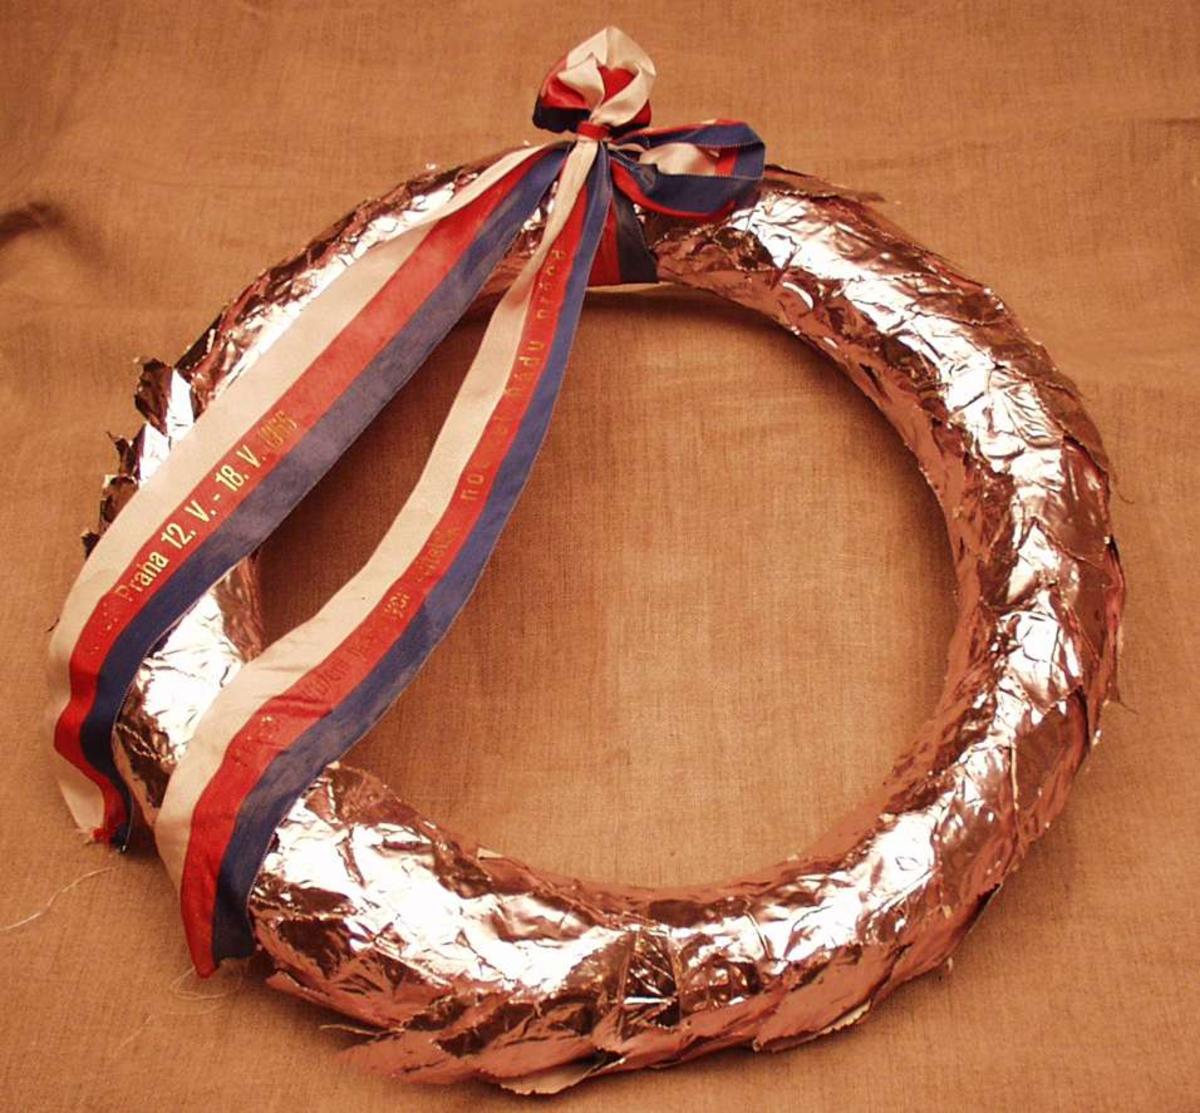 Krans i aluminiumsfolie, pyntet med bånd i rødt, hvitt og blått.